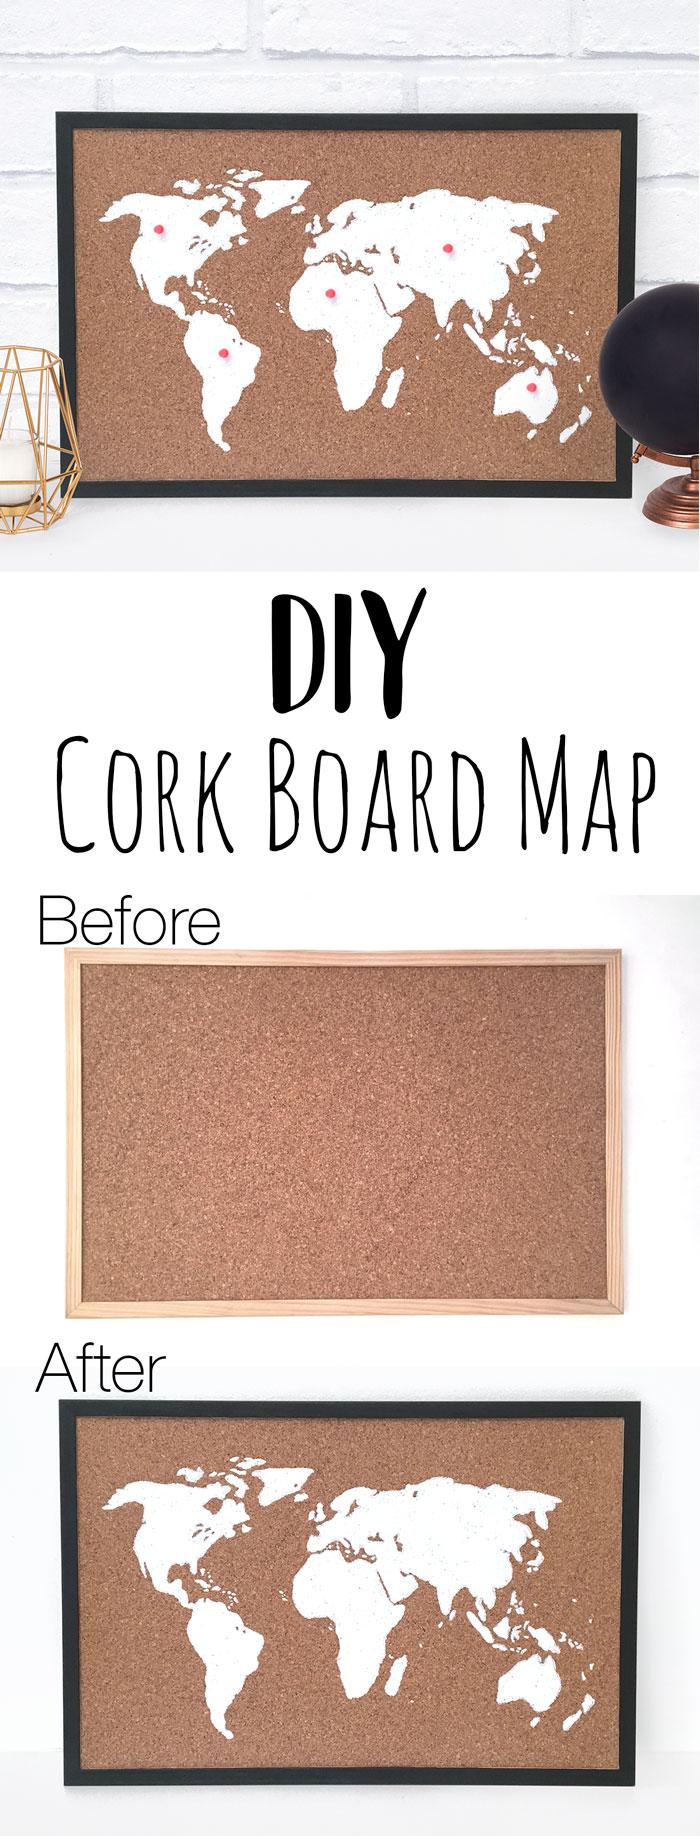 corkboard-map-craft-pin.jpg